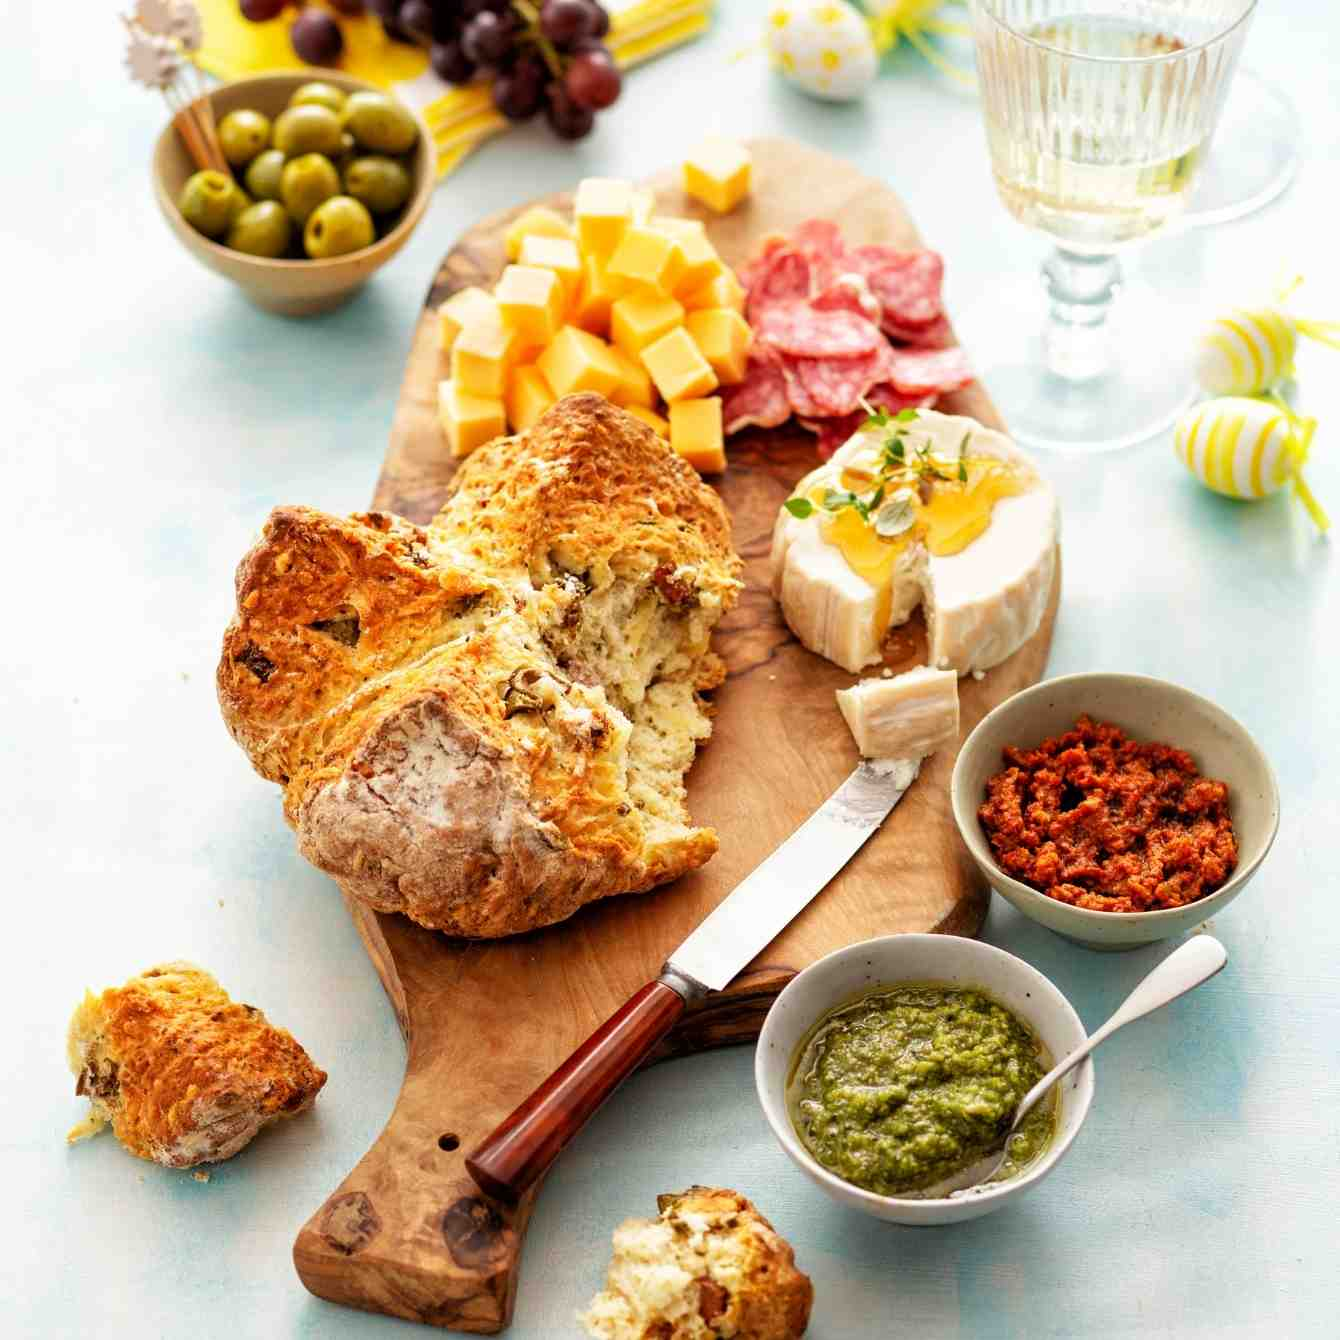 Hartig breekbrood met olijven, salami en kaas